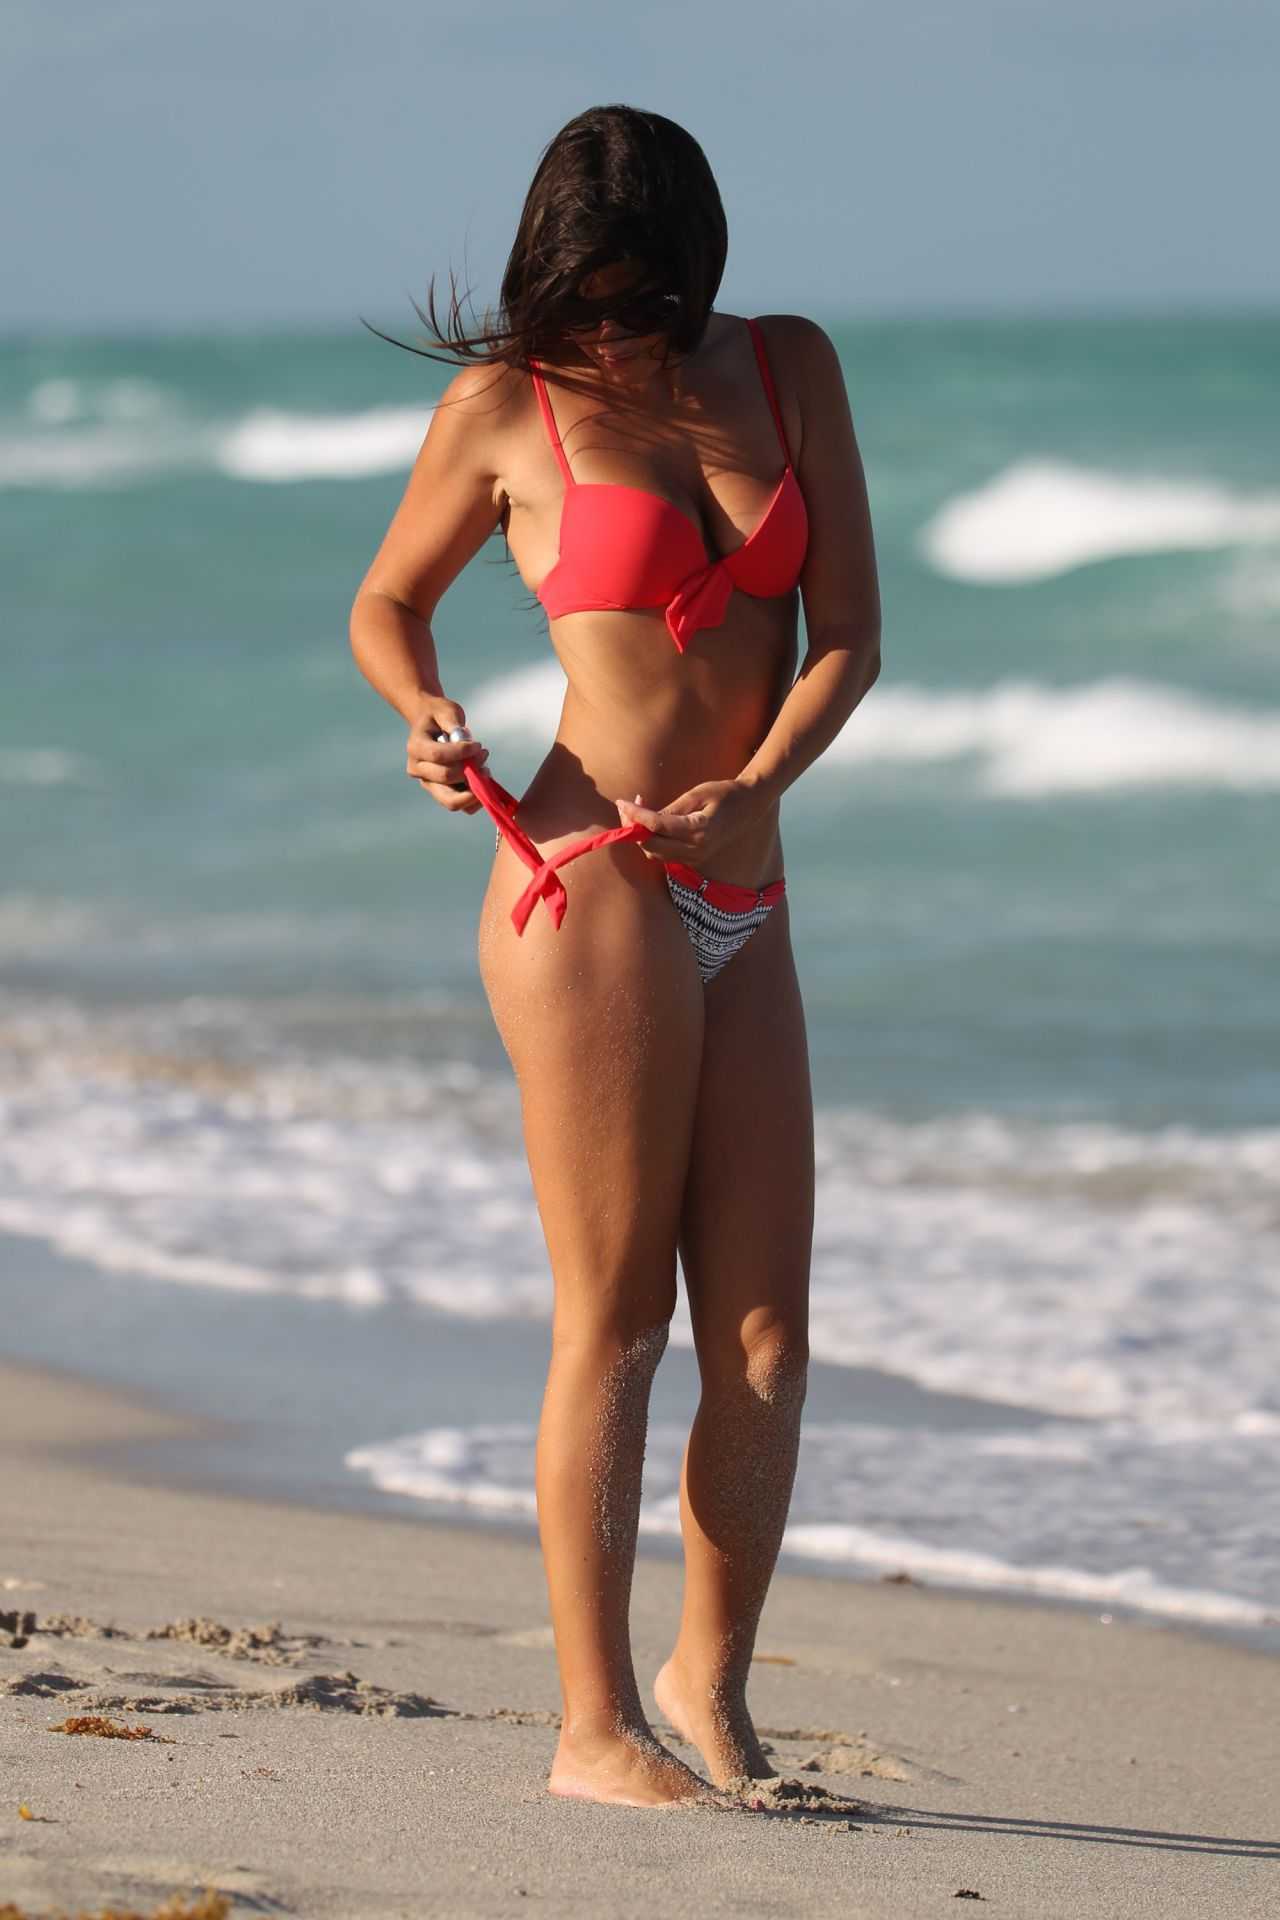 Cell phone bikini pics consider